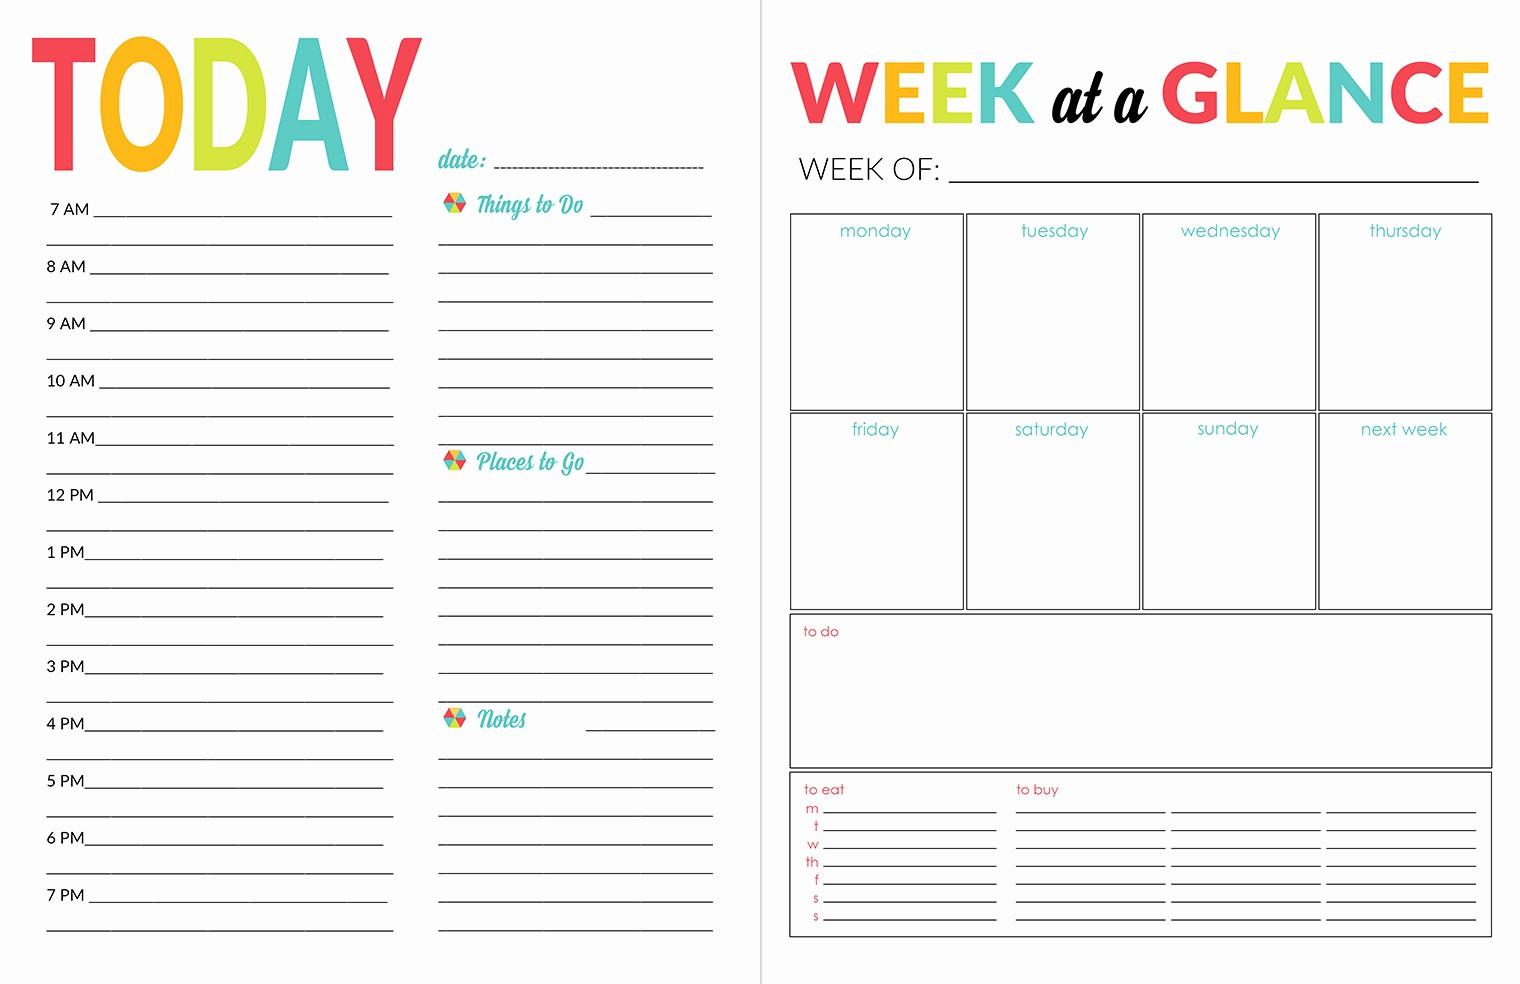 The Office Daily Calendar 2017 Elegant School Year organizer & Planner Printable Pack Yellow